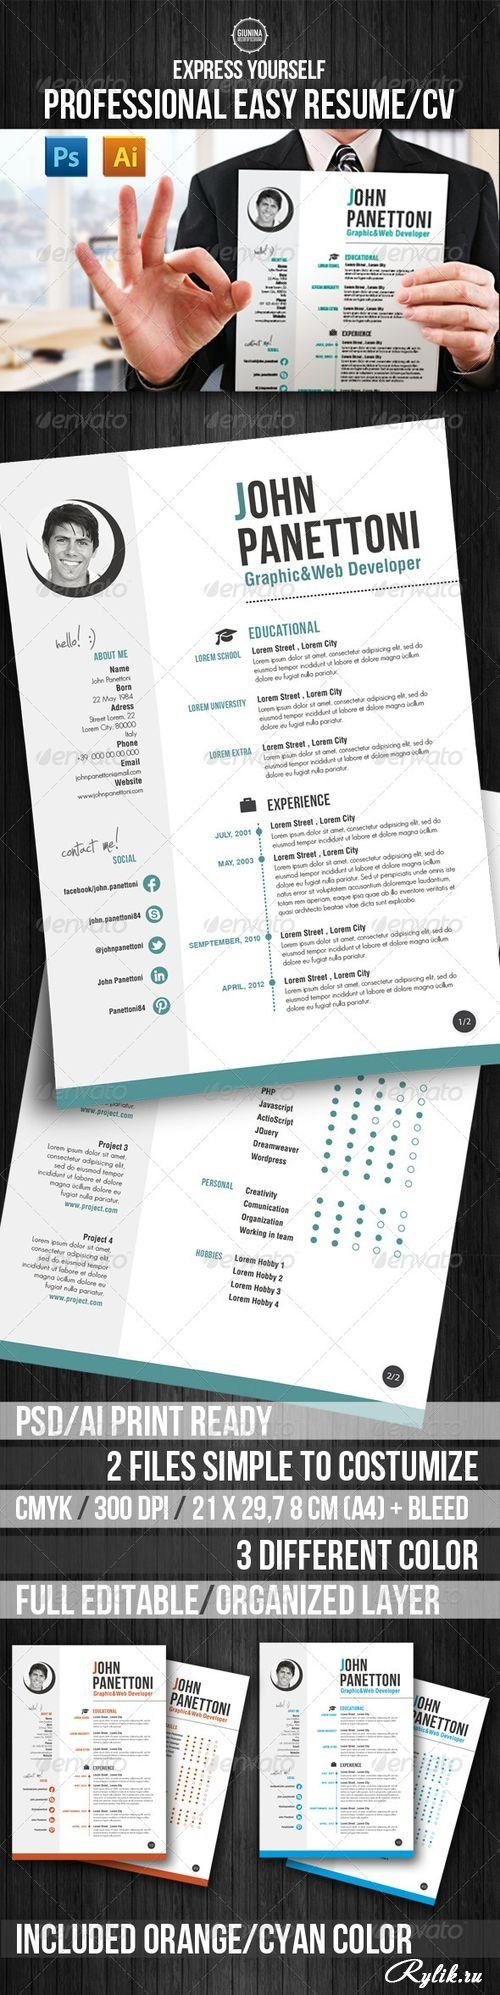 Резюме PSD шаблон. Professional Easy Resume/CV